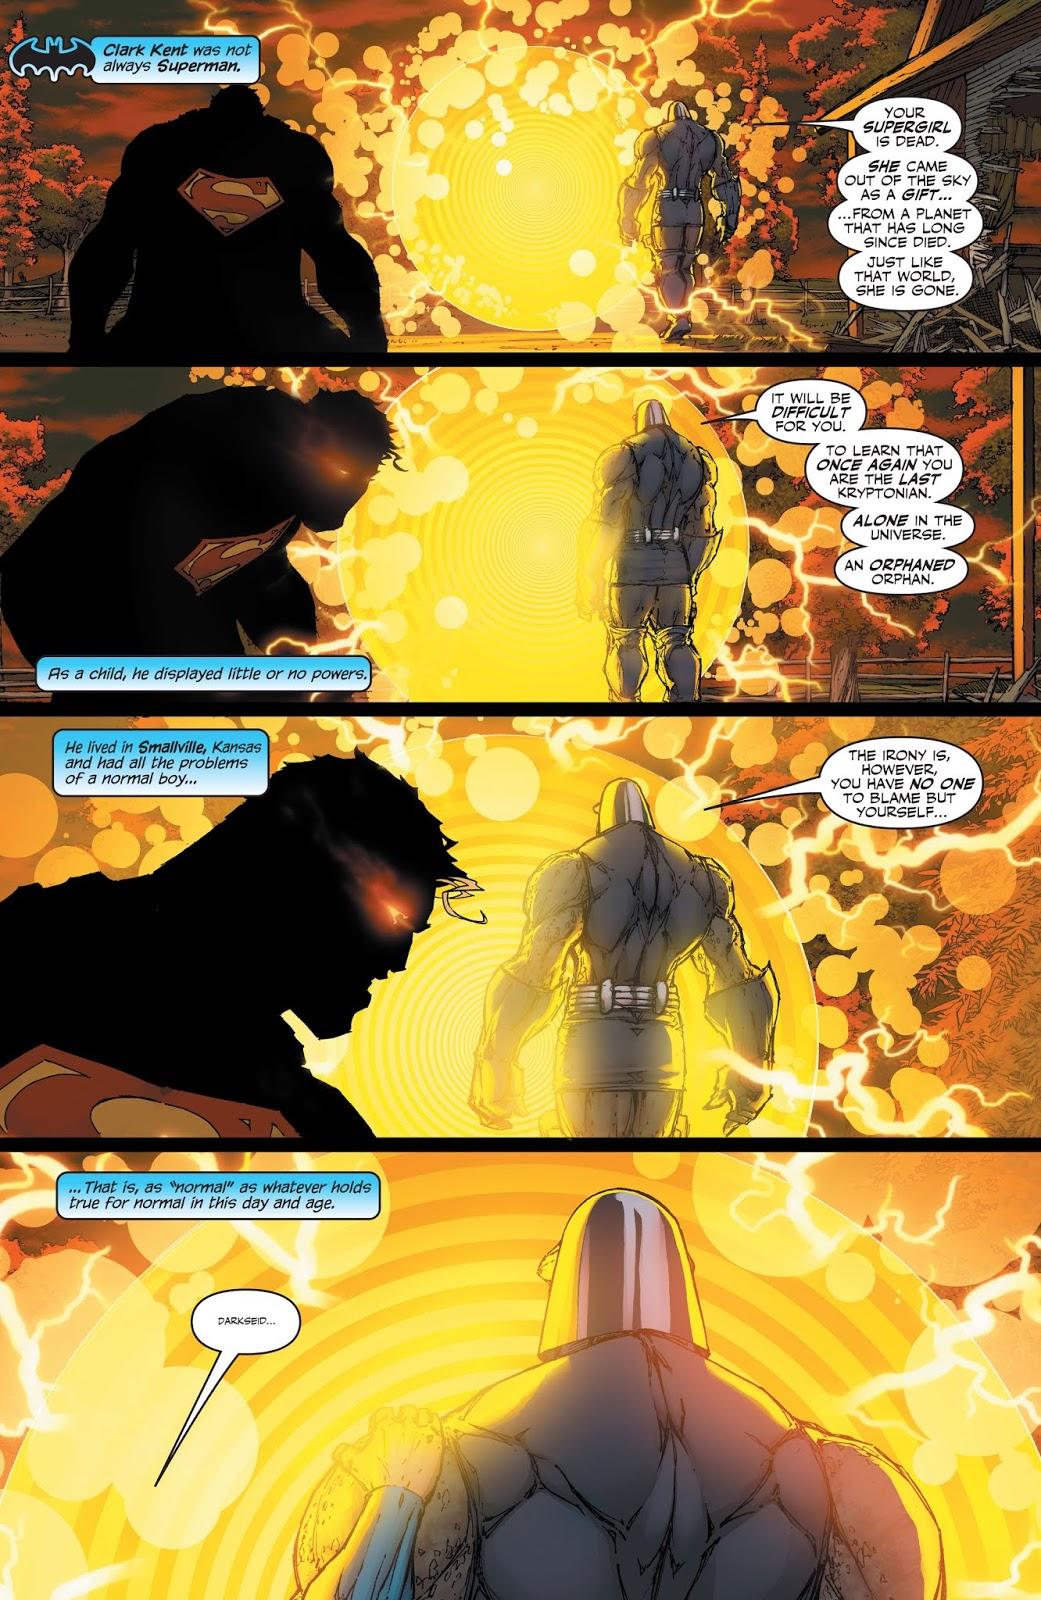 In 'Superman/Batman' (2004) #13, Superman is angry and battles Darkseid.